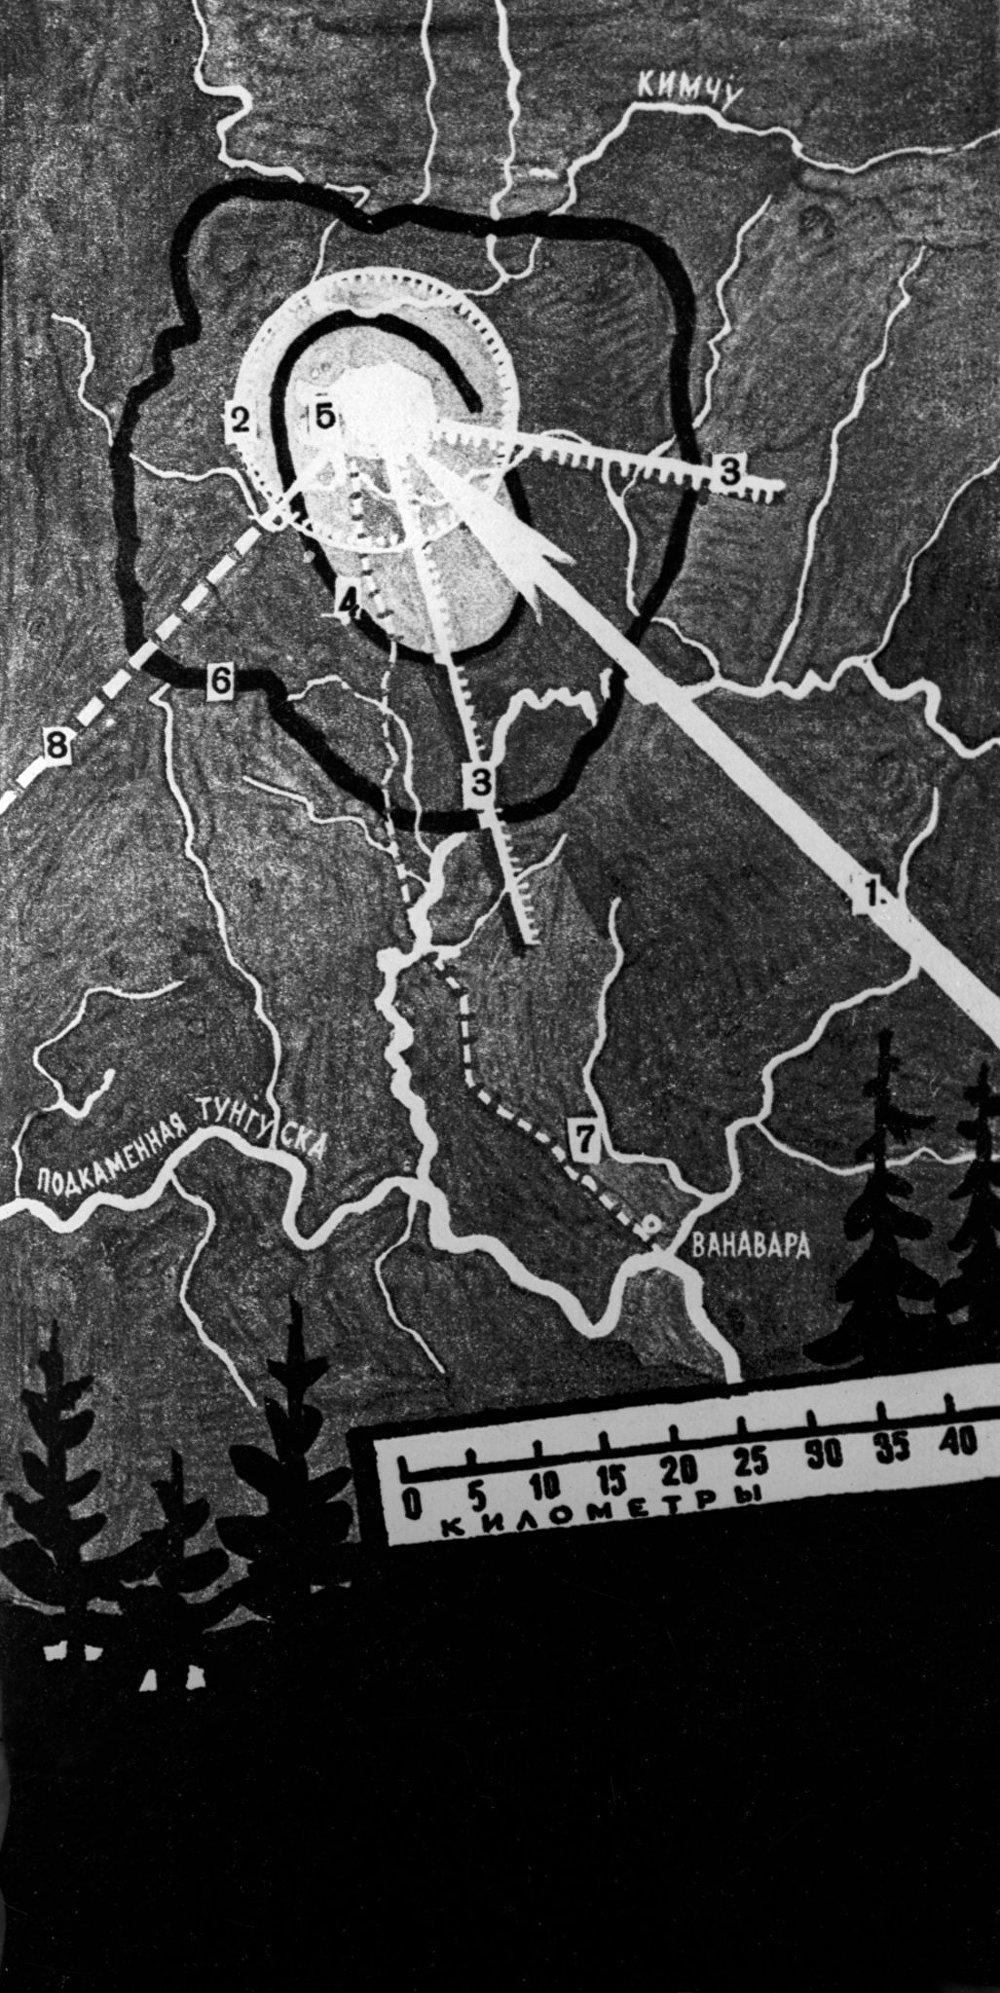 خريطة مكان سقوط نيزك تونغوسك